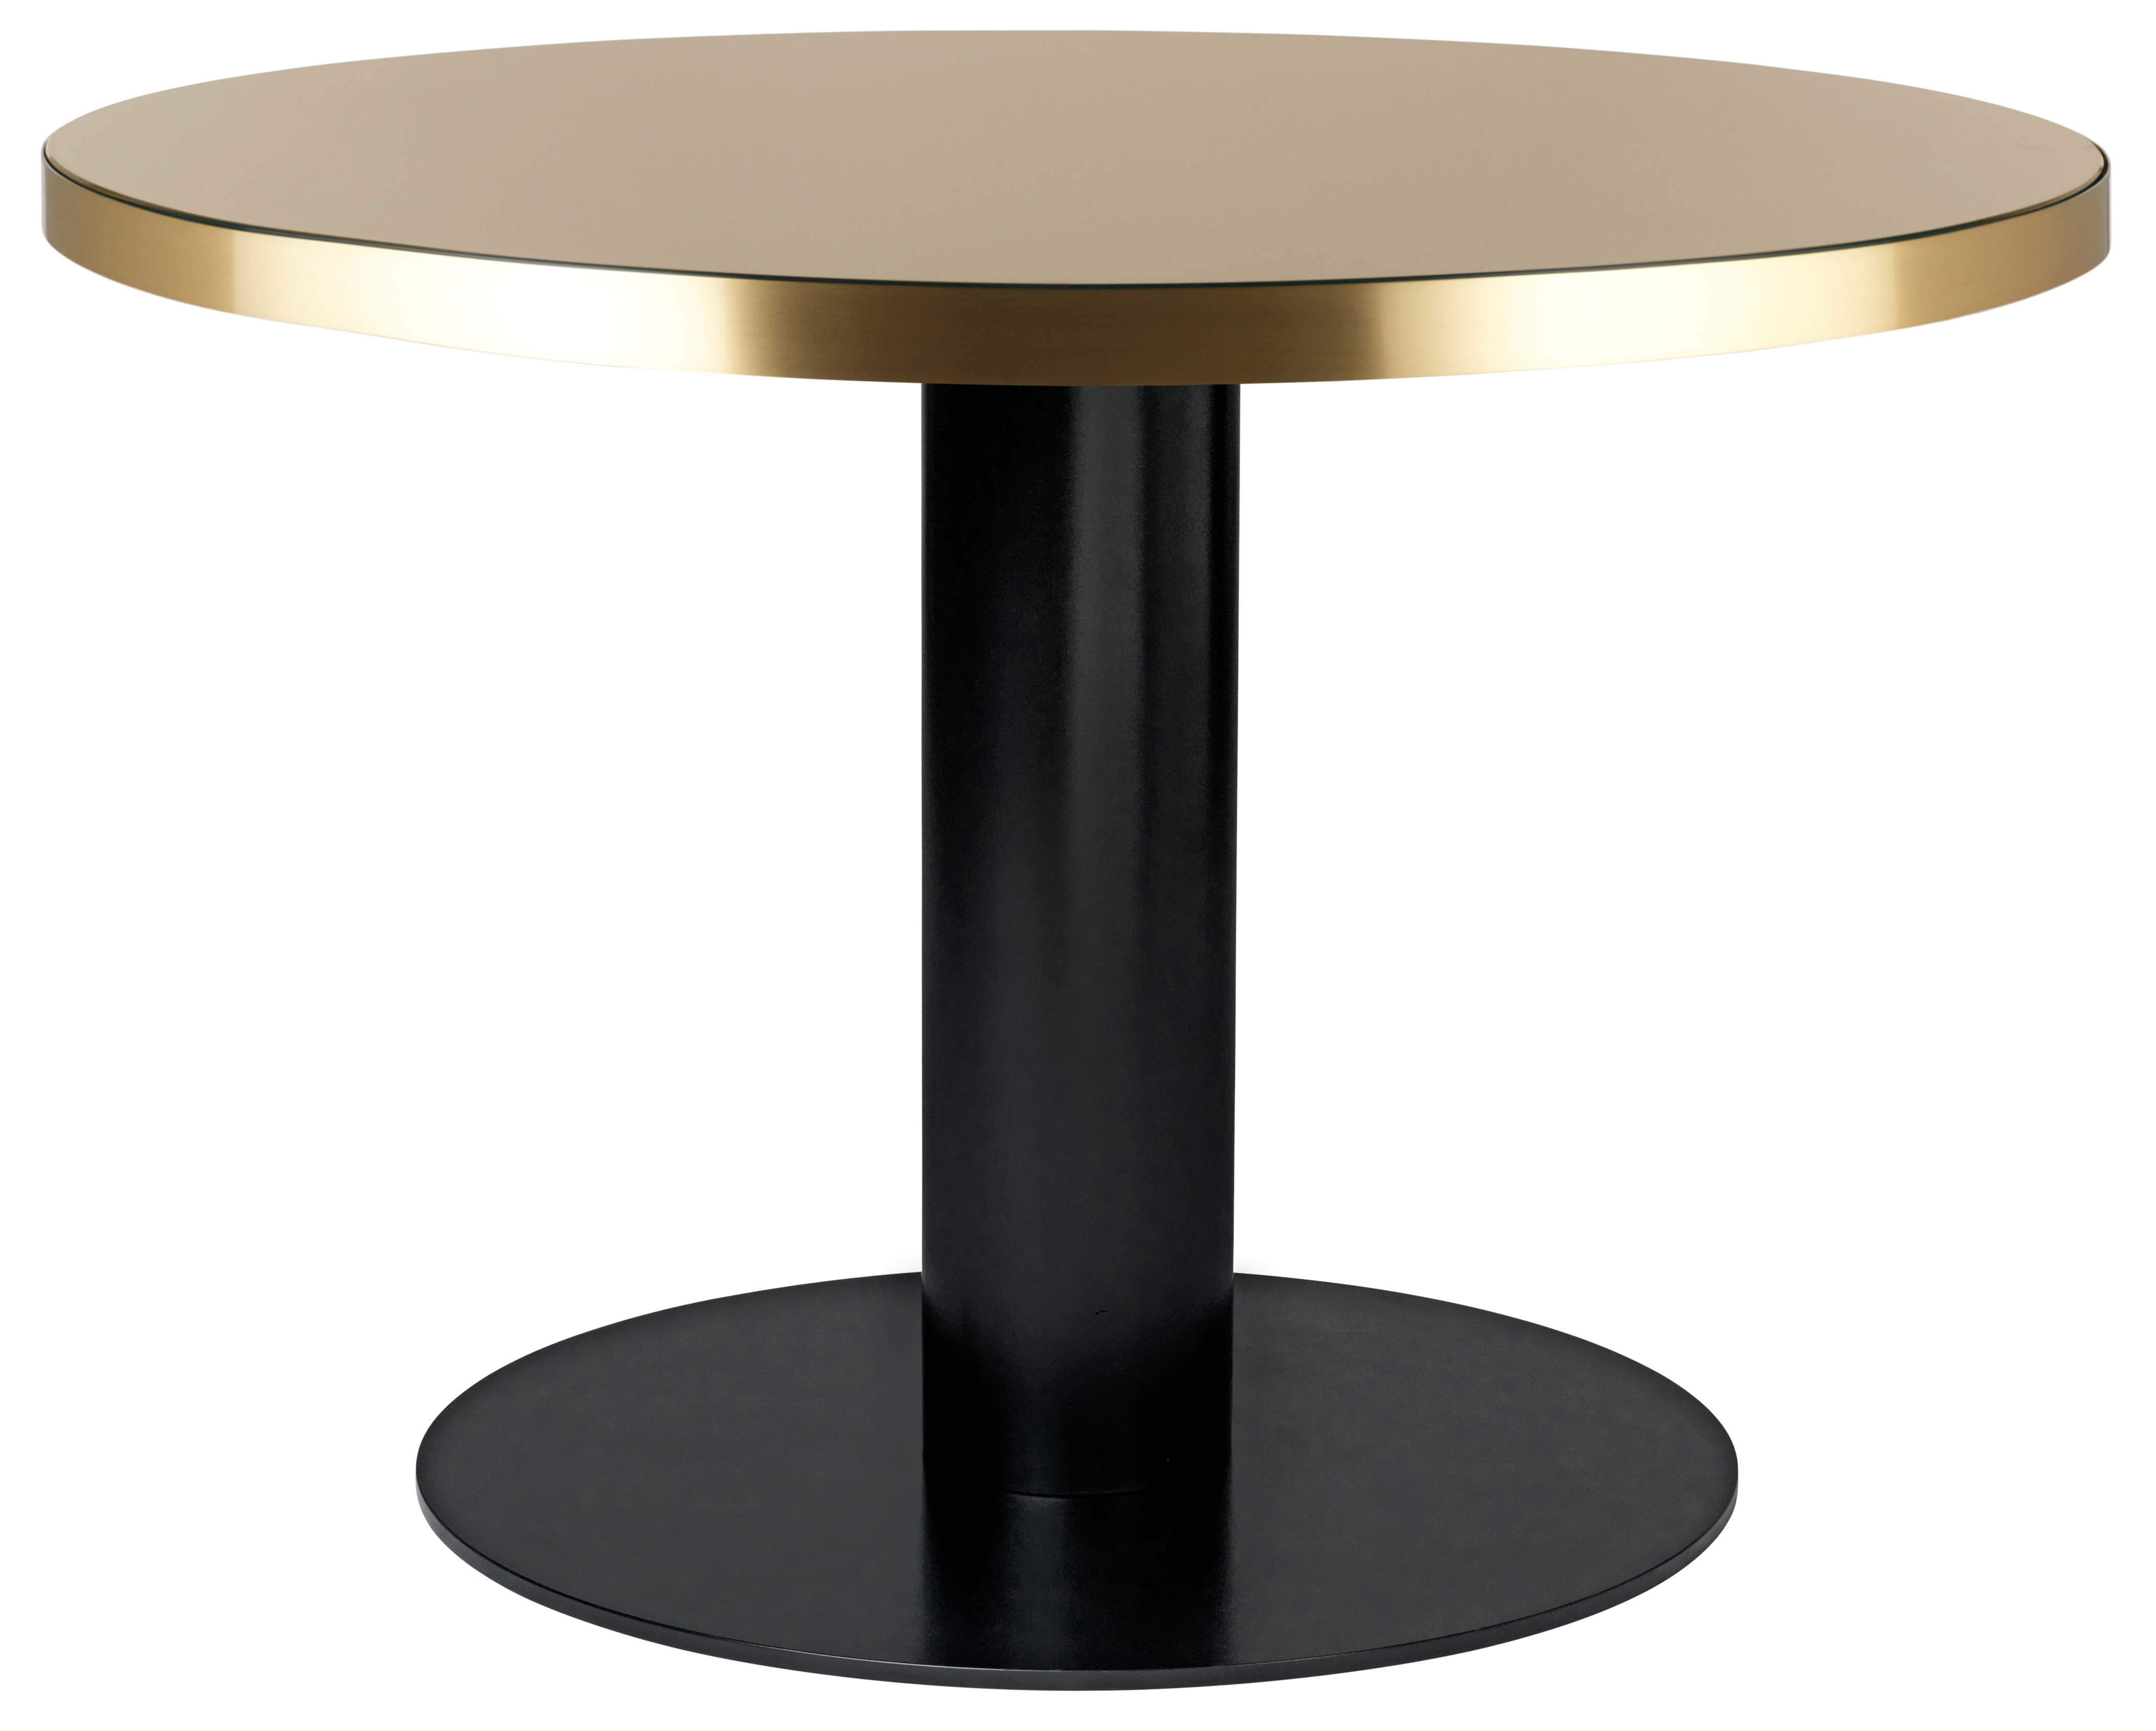 Granit Grey Table Top + Brass Base